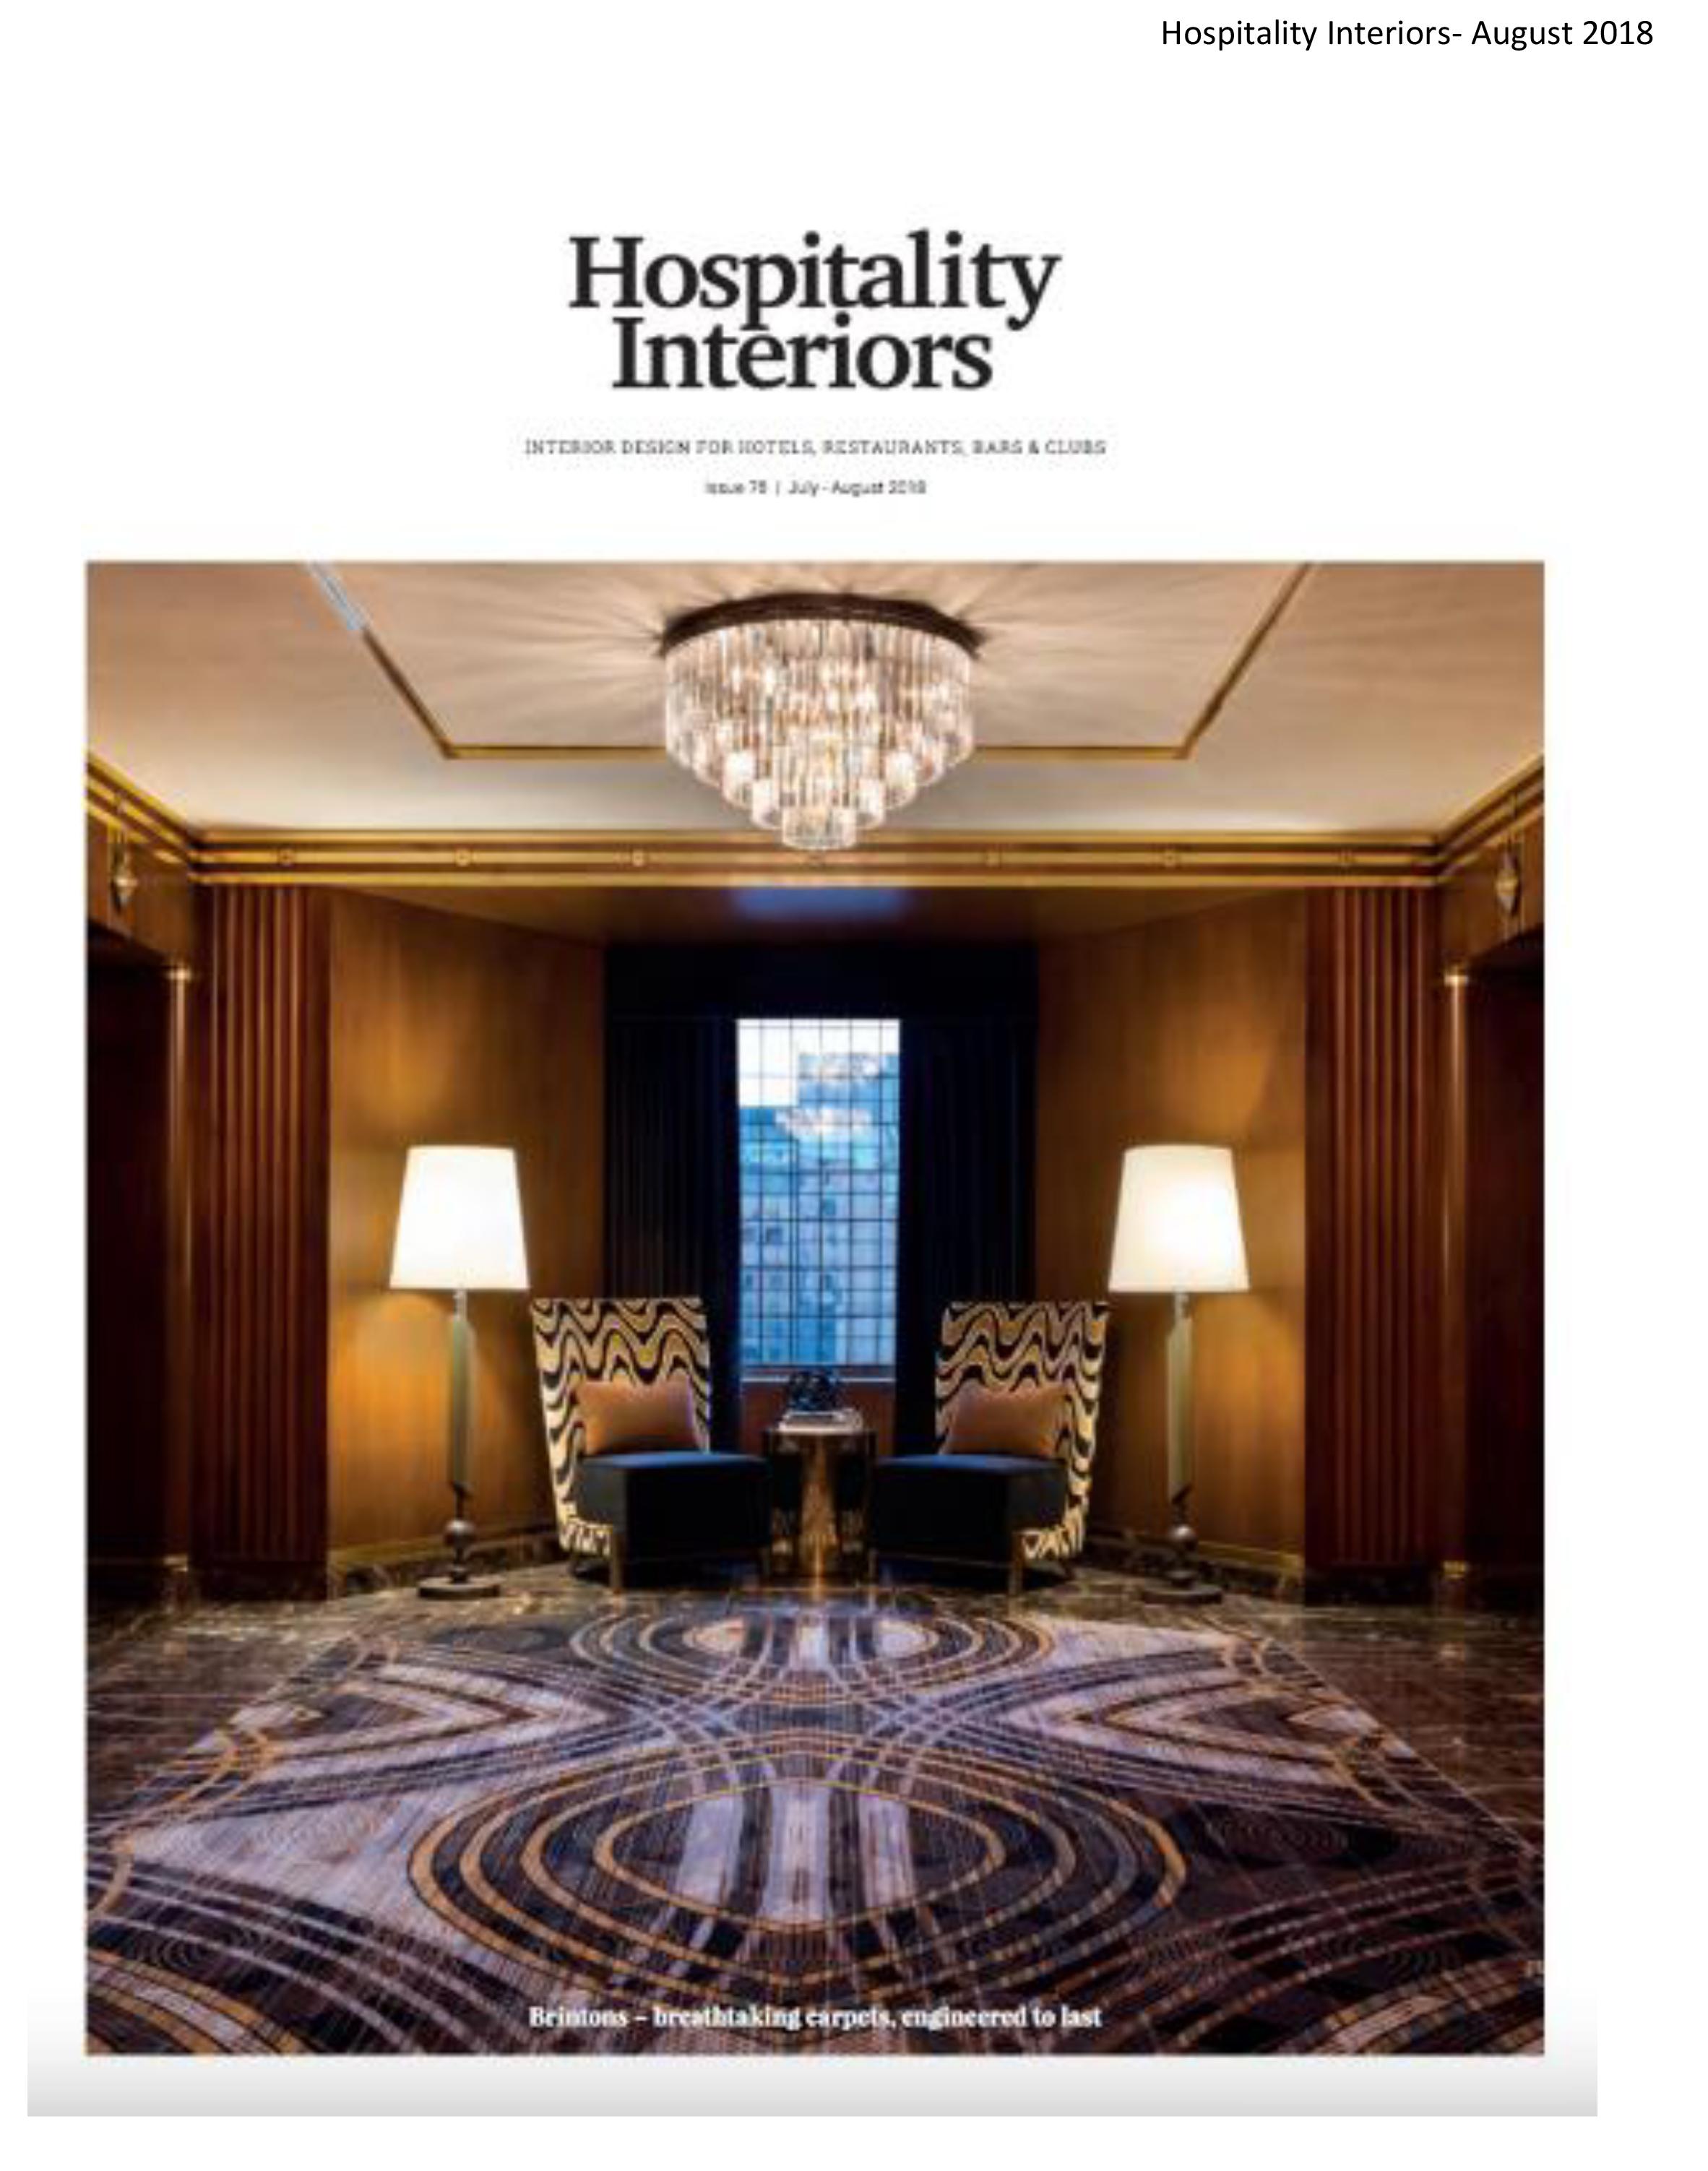 Hospitality Interiors- August 2018-1.jpg